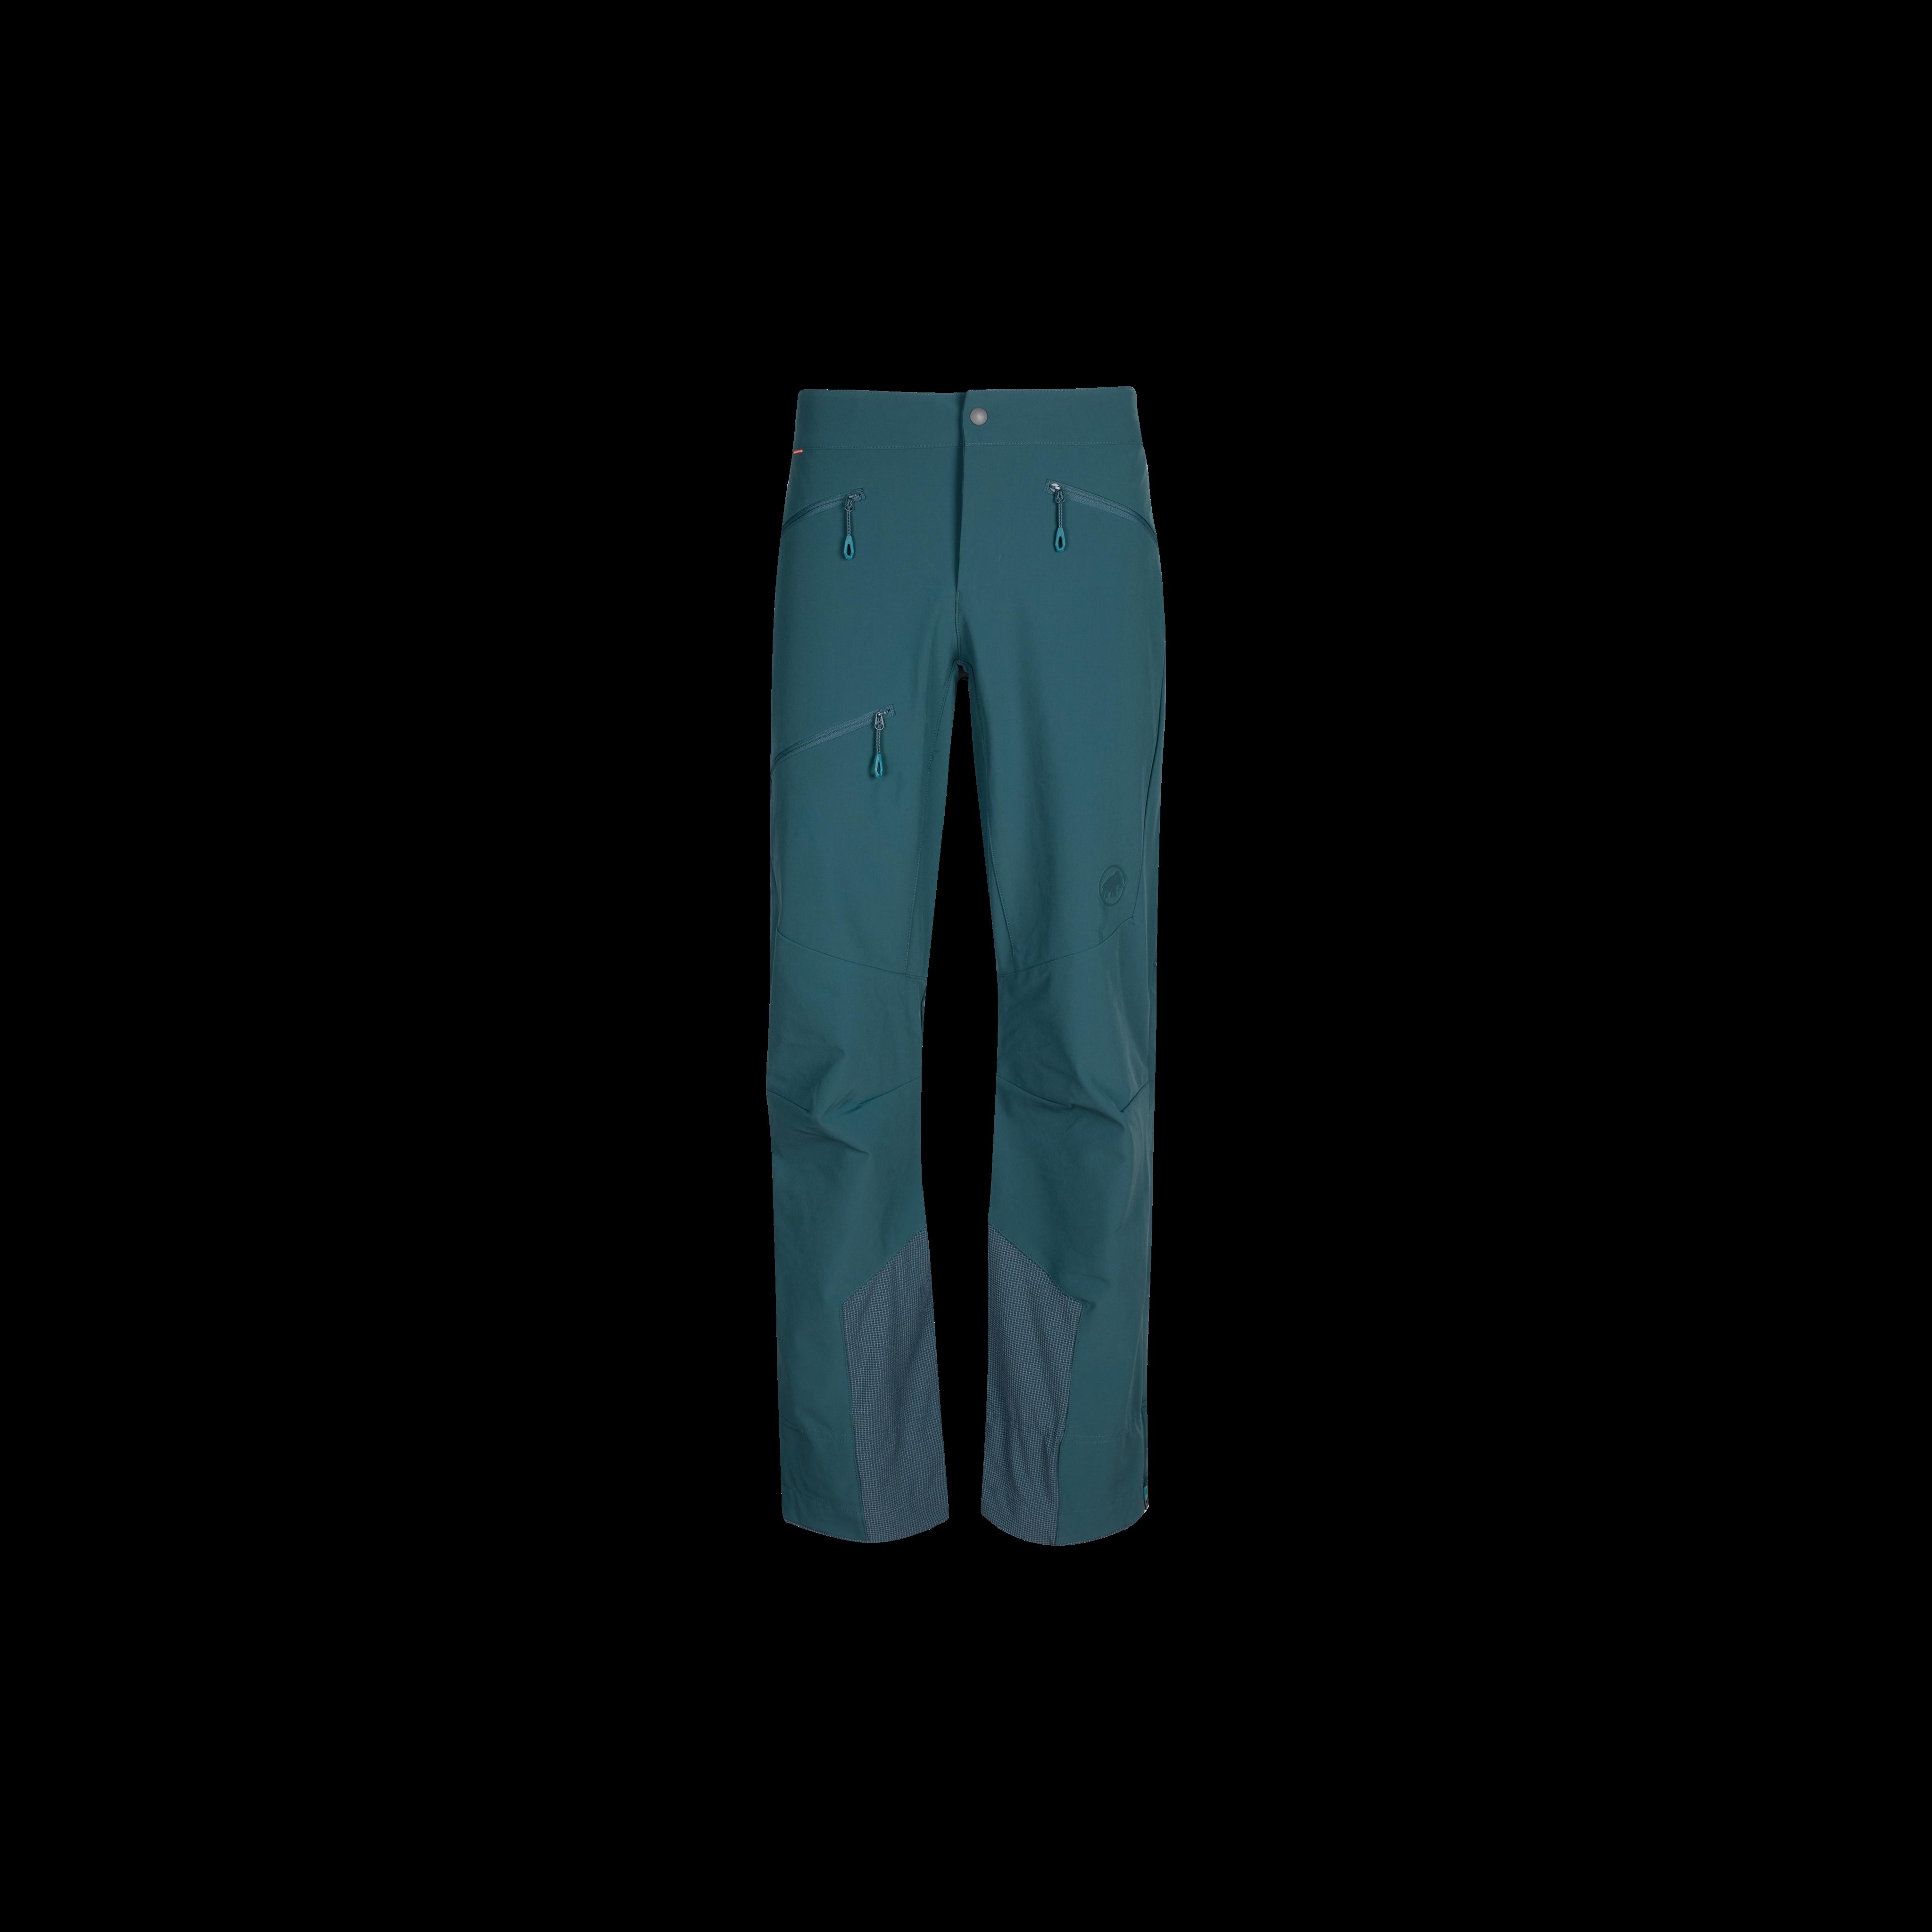 Tatramar SO Pants Men - normal, UK 32, wing teal thumbnail